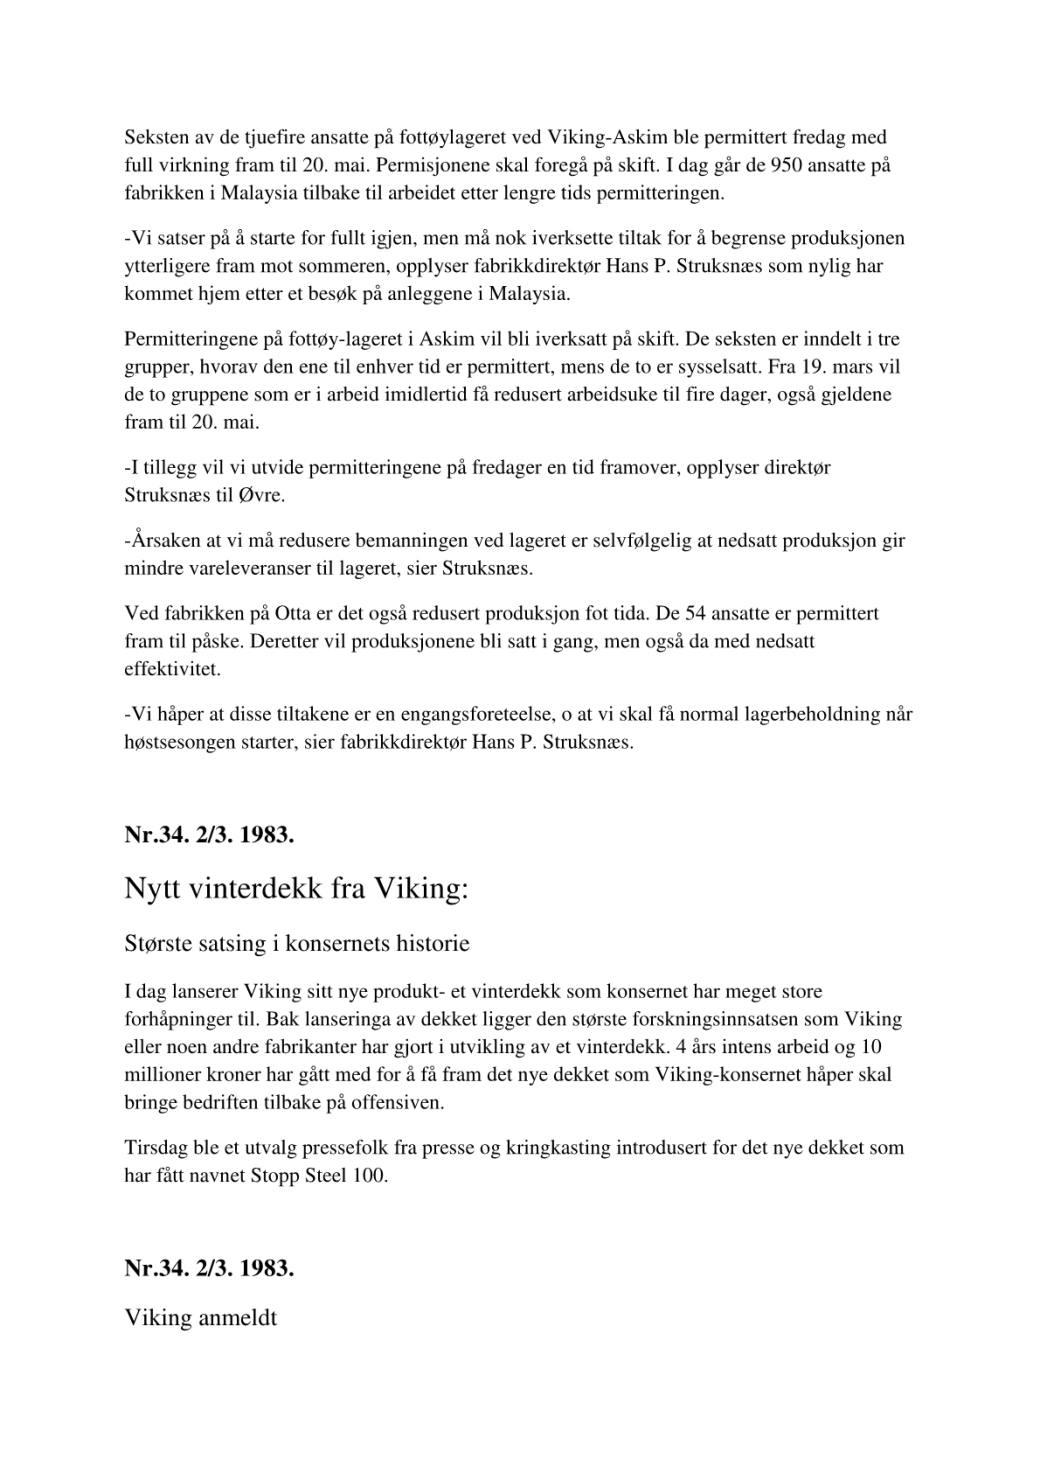 8b78c85d Index of /doks/Industribok6/files/assets/mobile/pages